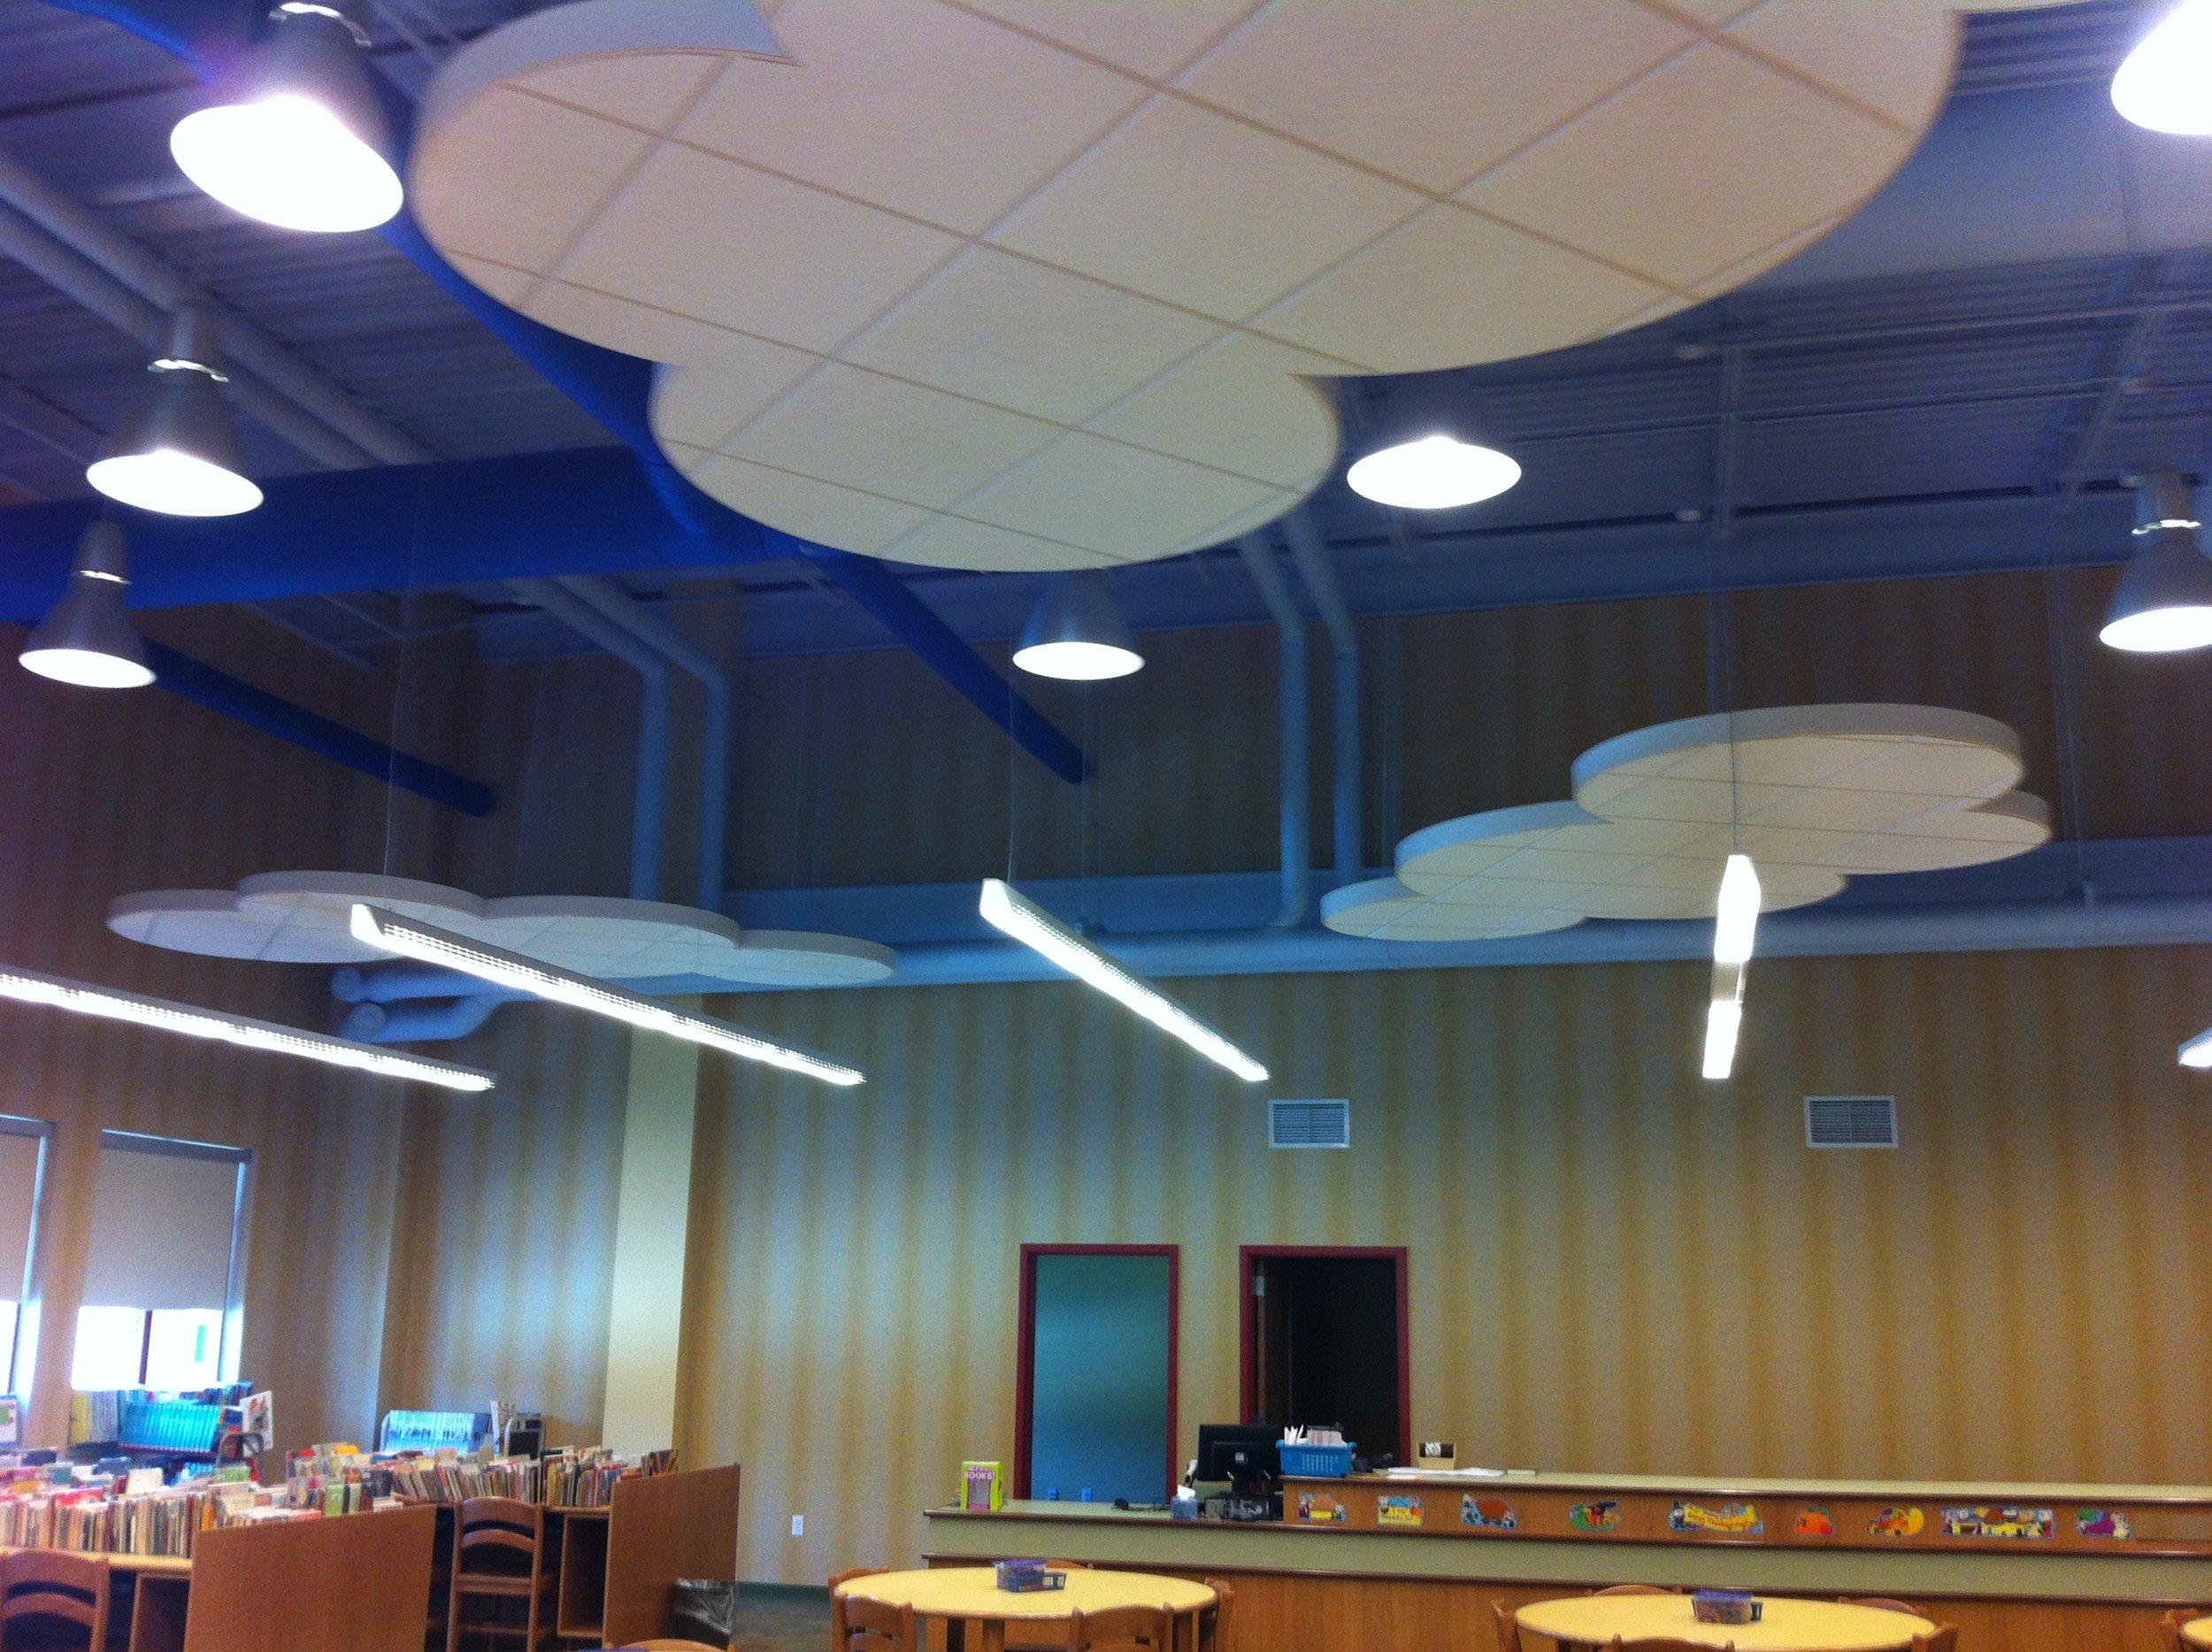 State-Street-Elementary-Cloud-Ceiling-Interior-Design.jpg